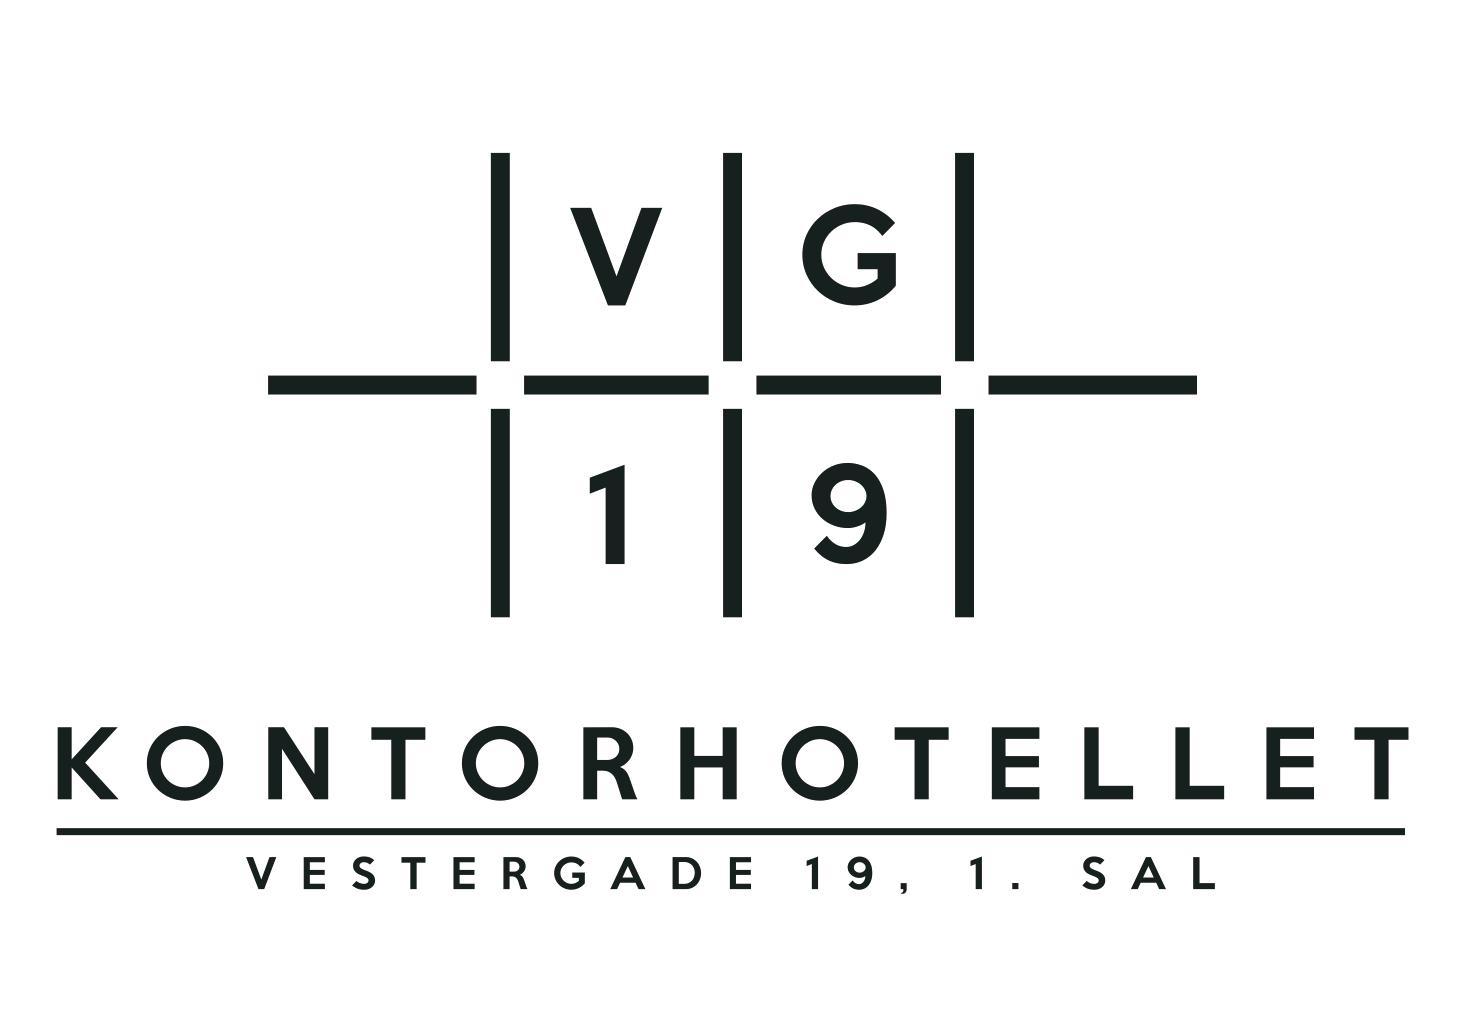 VG19 logodesign